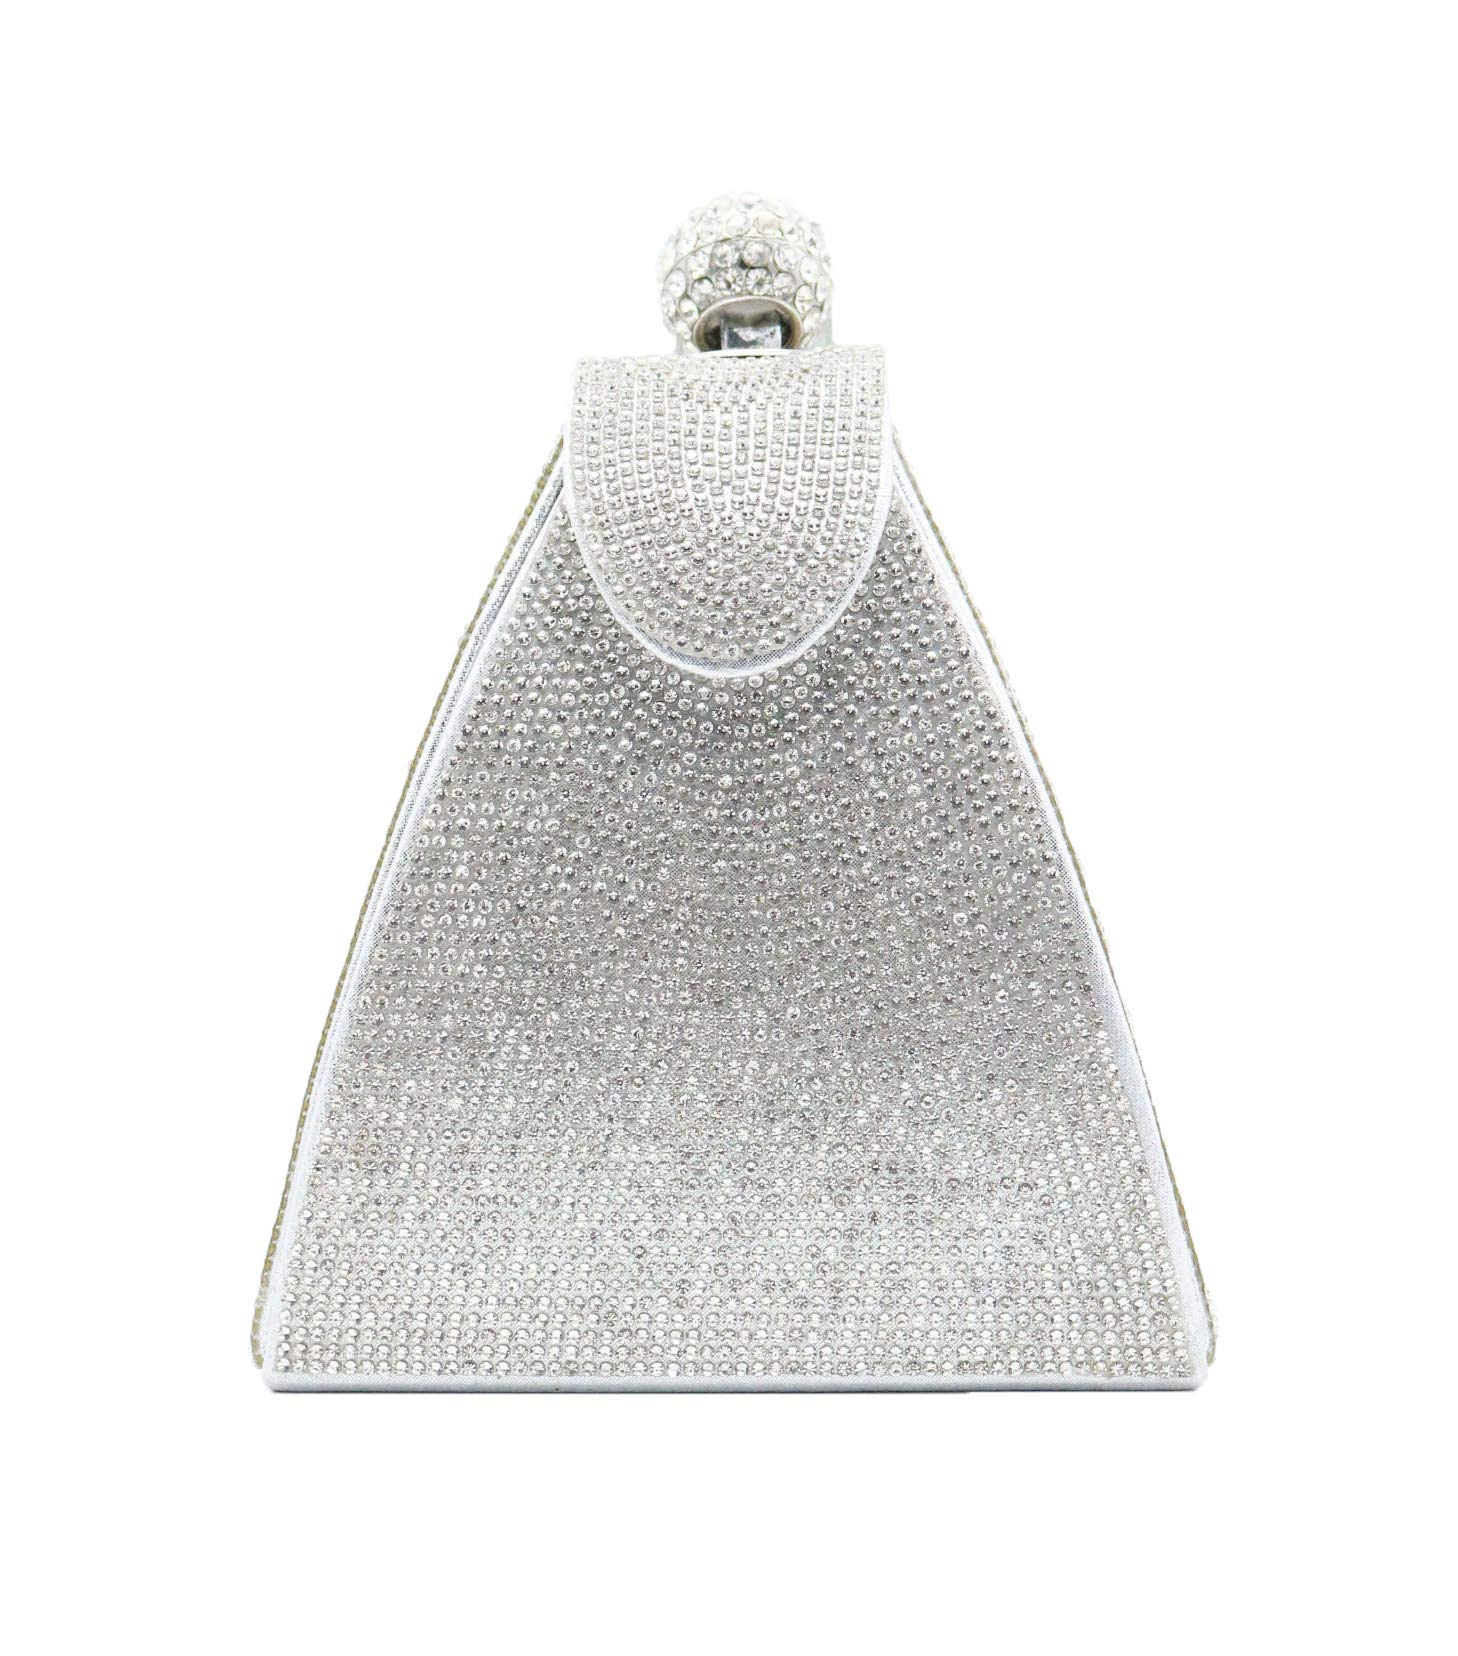 allx Full Rhinestone Fashion Evening Bag Triangle Women (Simple silver)